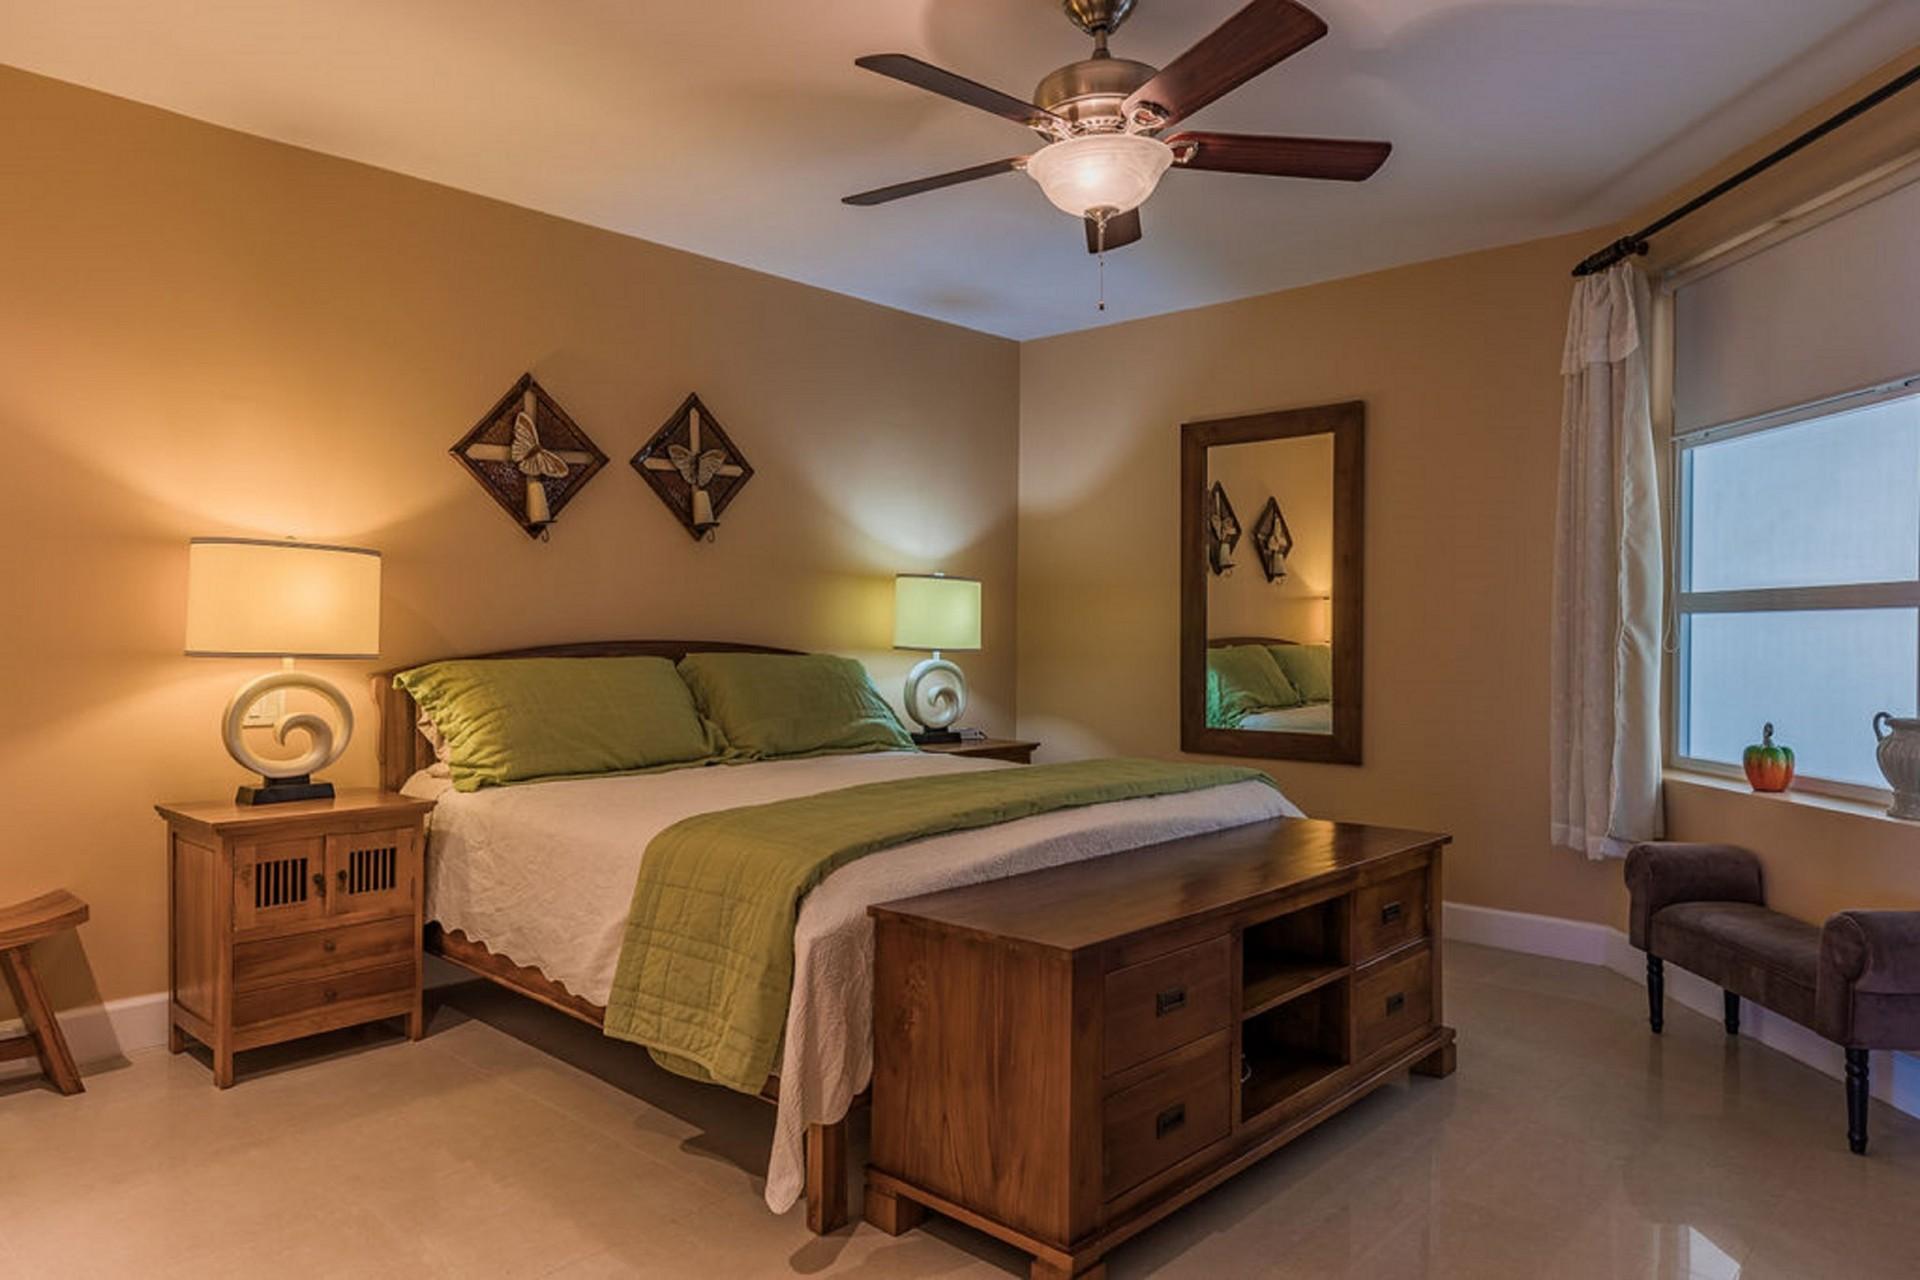 Oceania 432- Large 1 bedroom Ocean Front Condo w amazing views photo 17